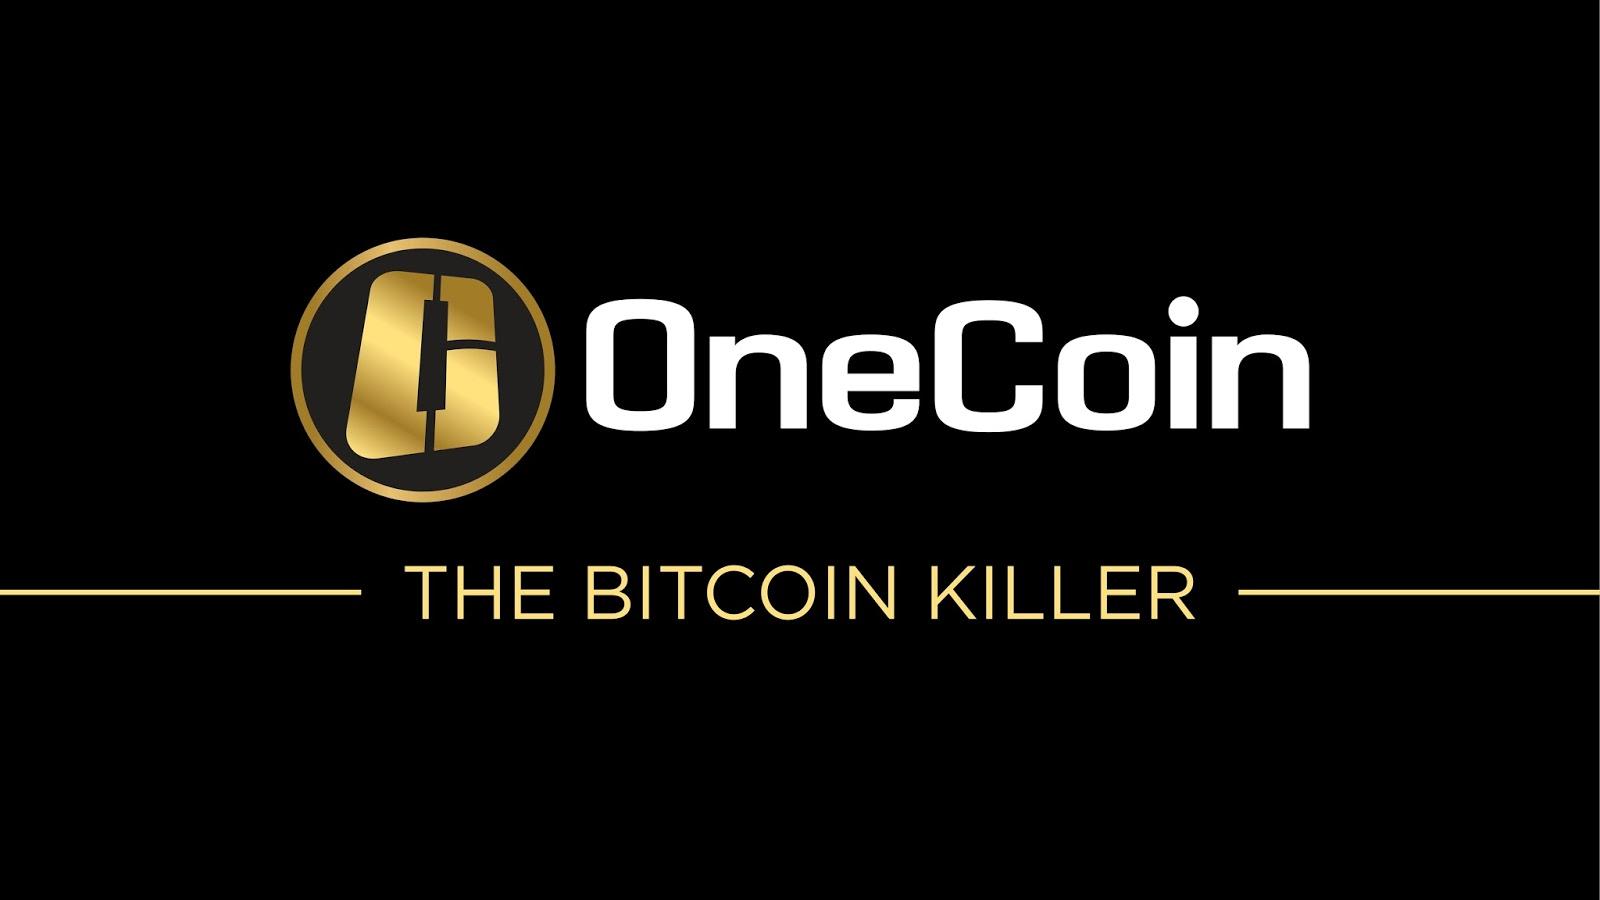 hogyan kell befizetni bitcoin bankba